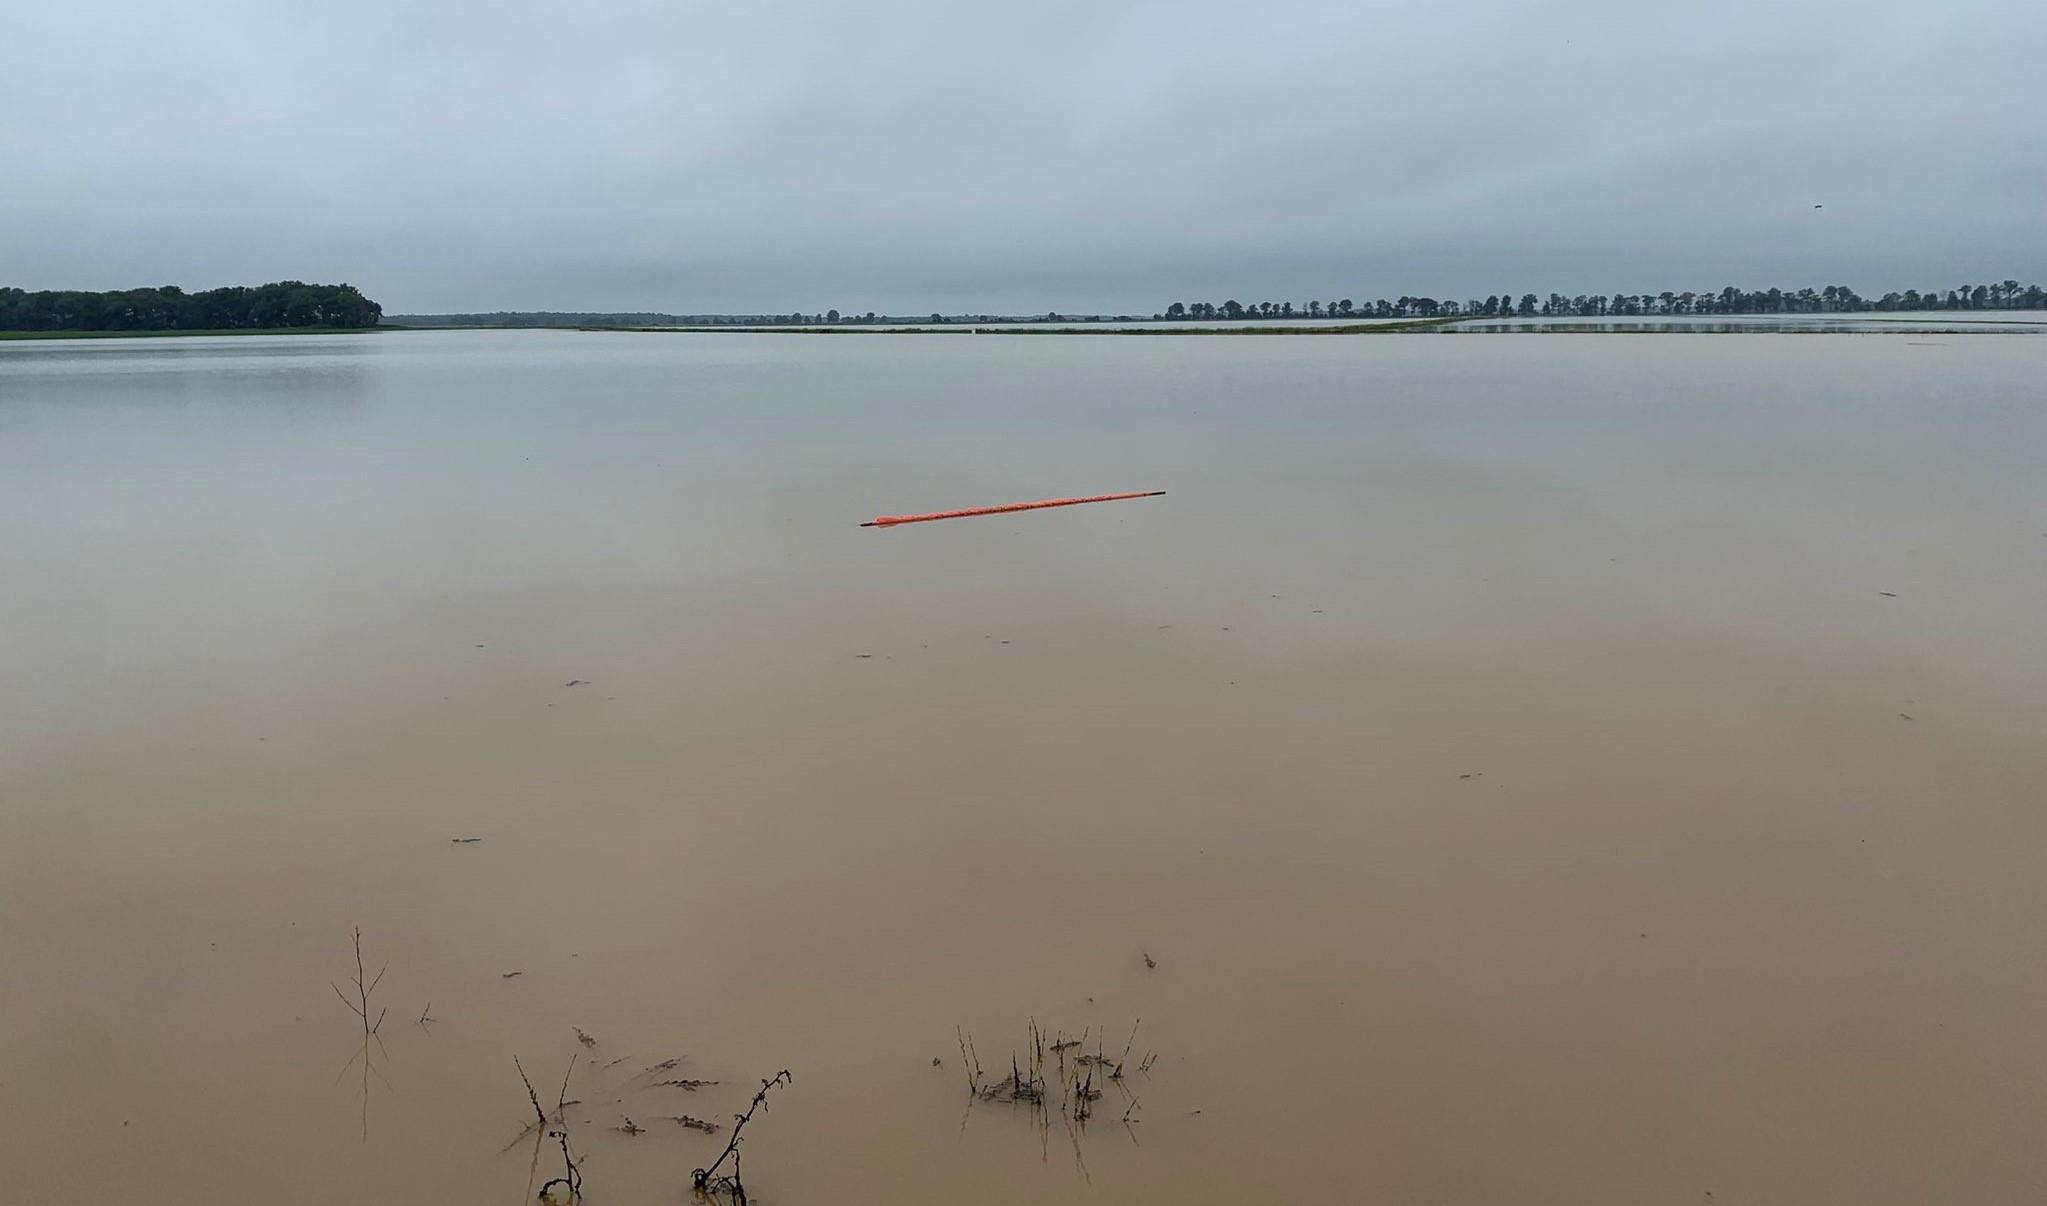 Submerged rice field